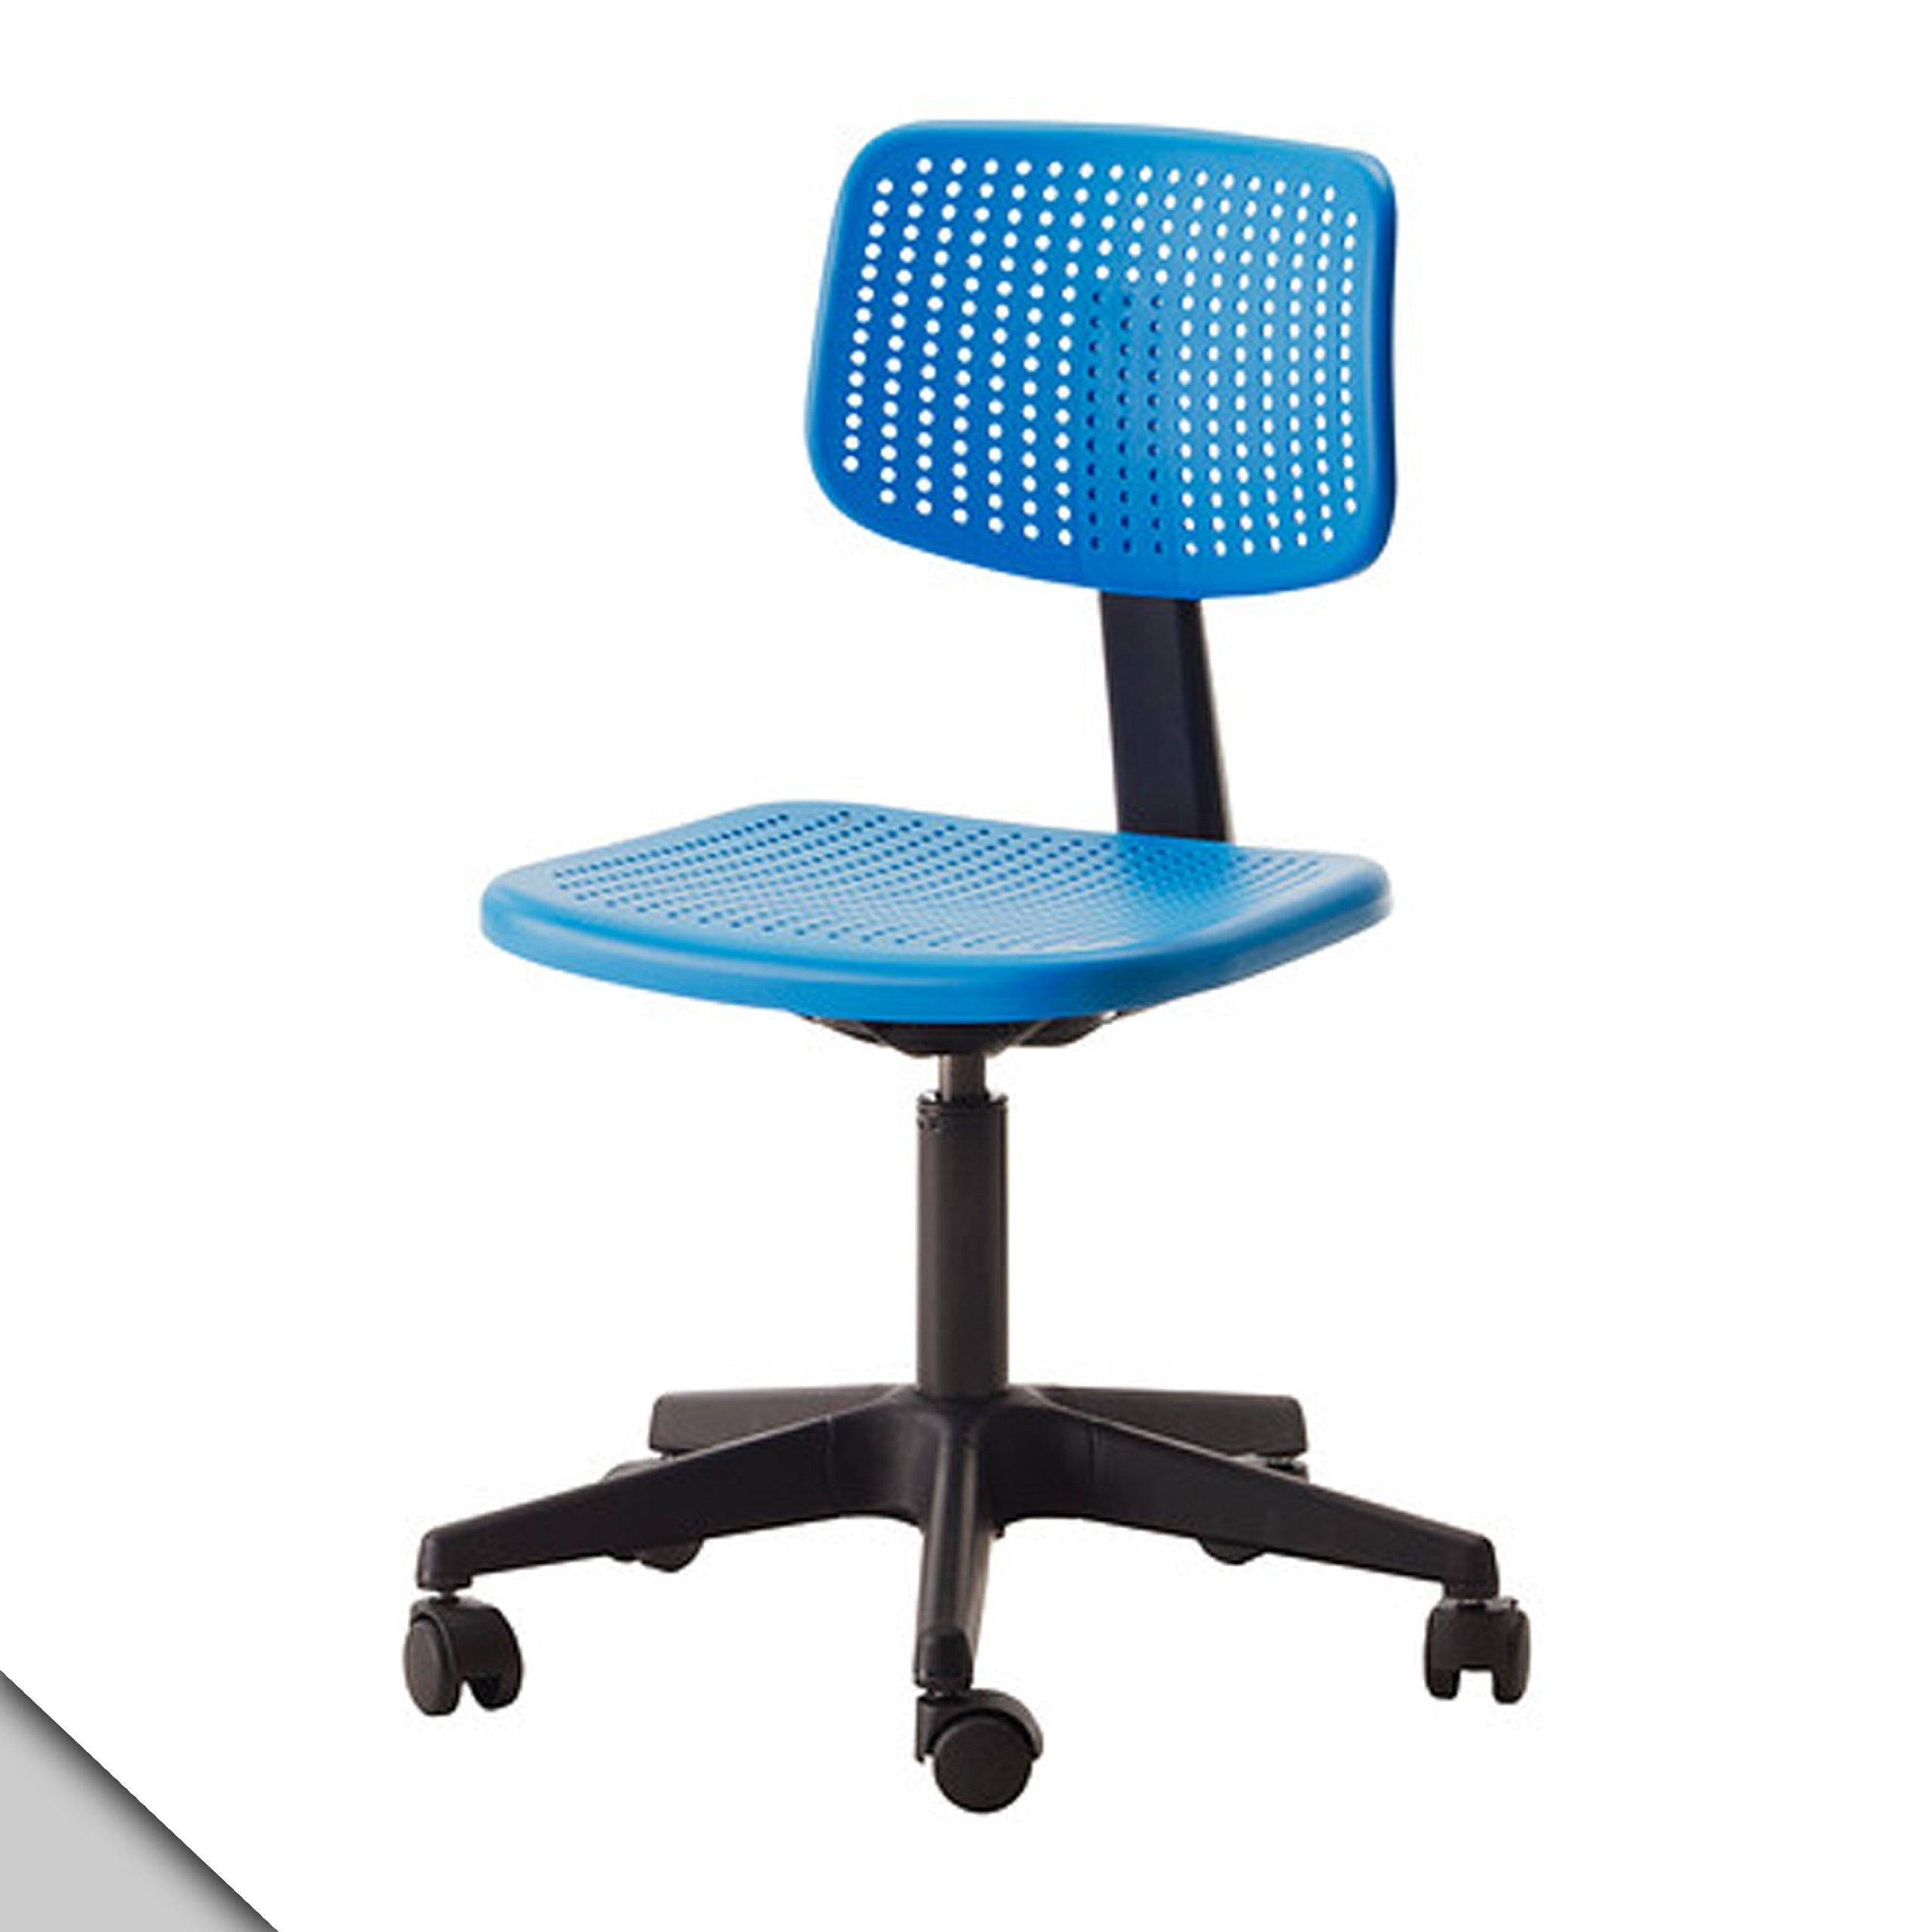 Ikea 402.141.17 - Silla de escritorio infantil, color azul: Amazon.es: Hogar